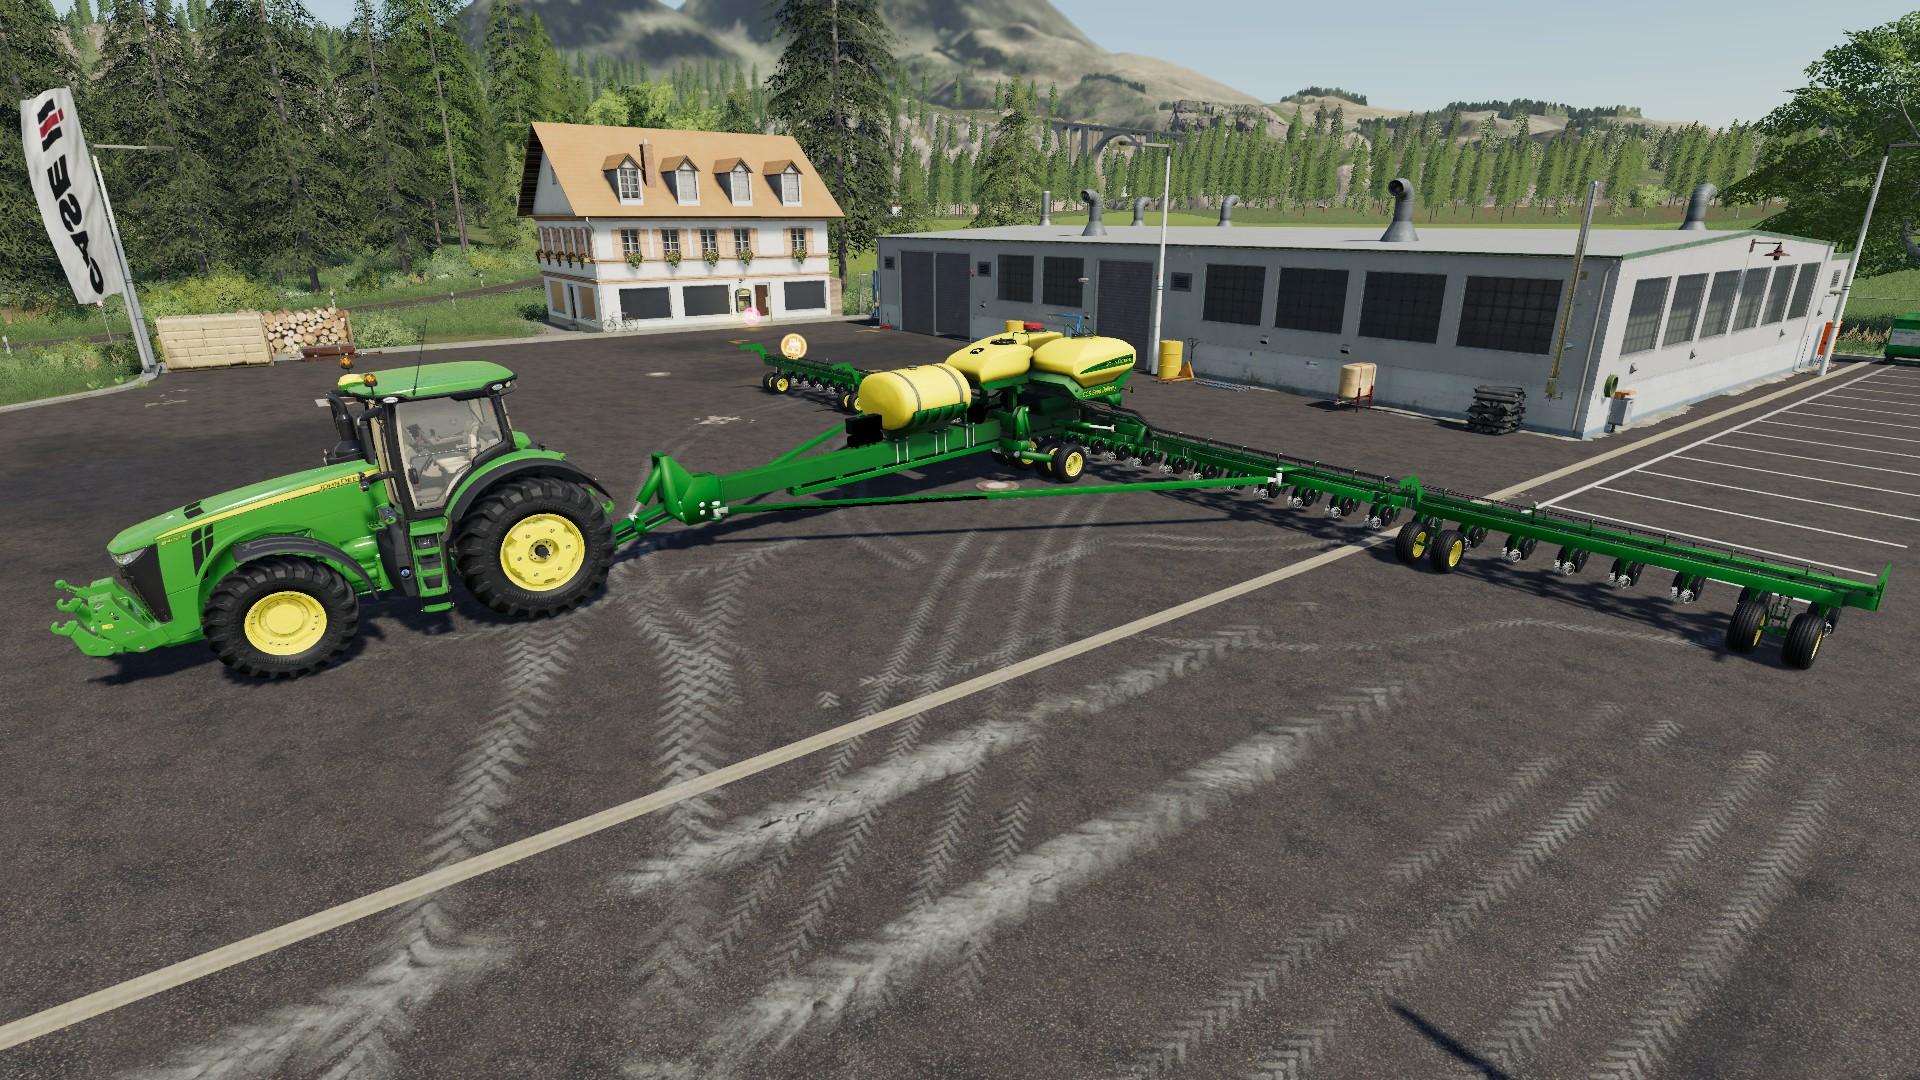 John Deere DB90 27M V1 2 FS19 - Farming Simulator 19 Mod